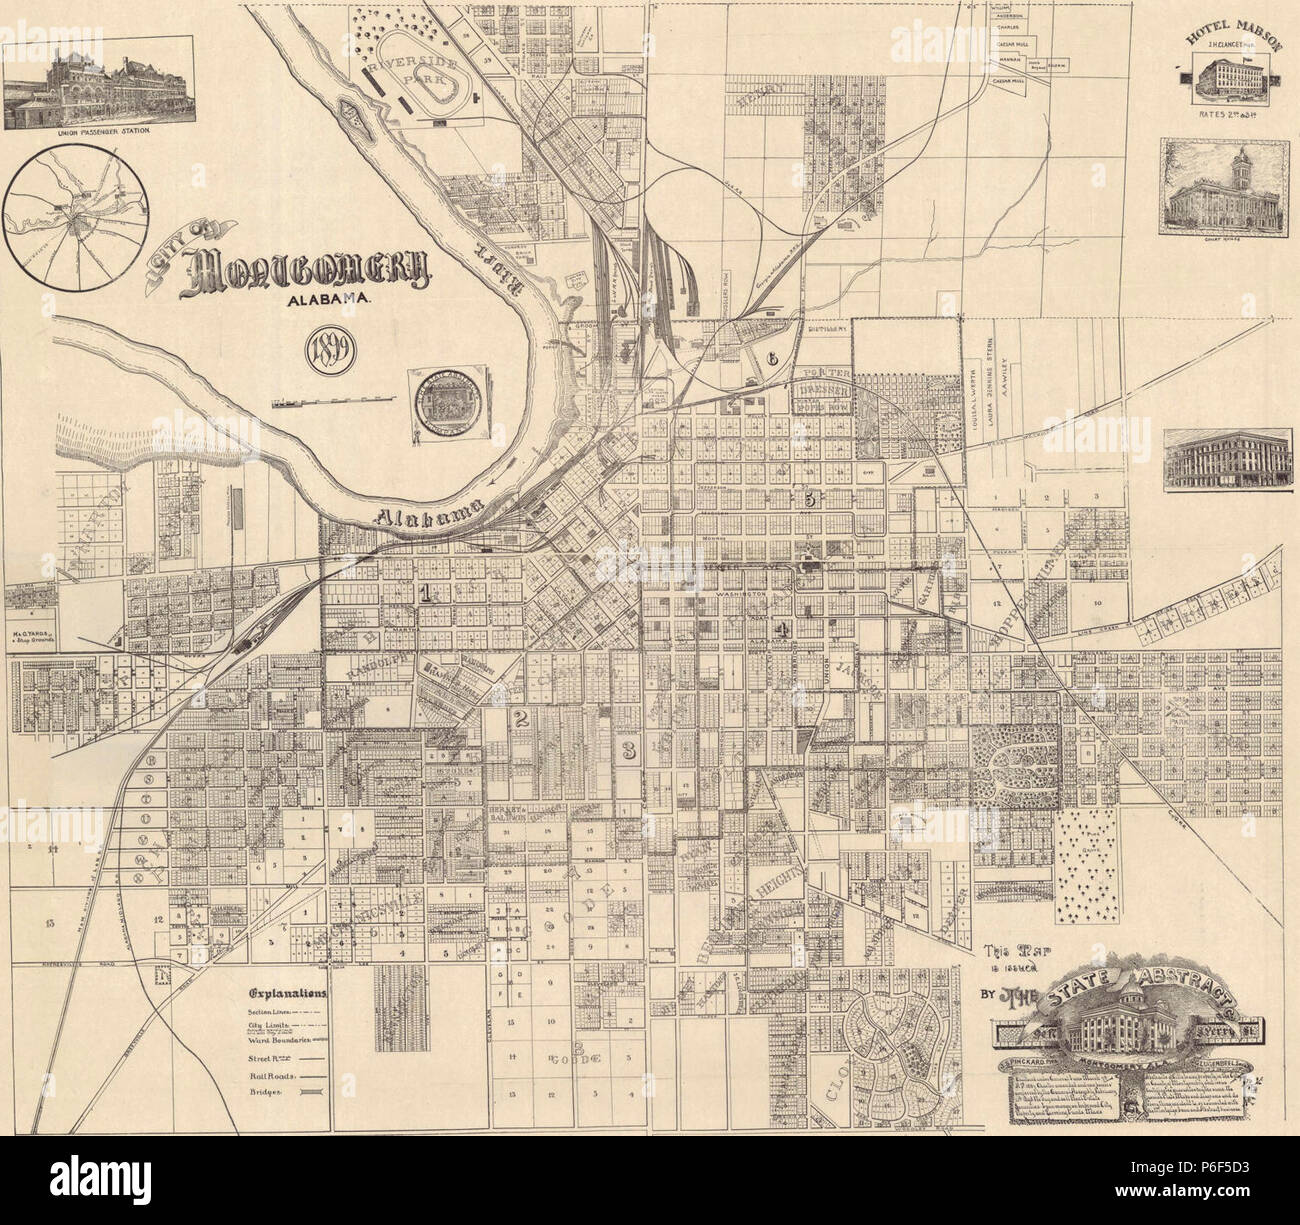 1899 map of Montgomery, Alabama Stock Photo: 210545919 - Alamy